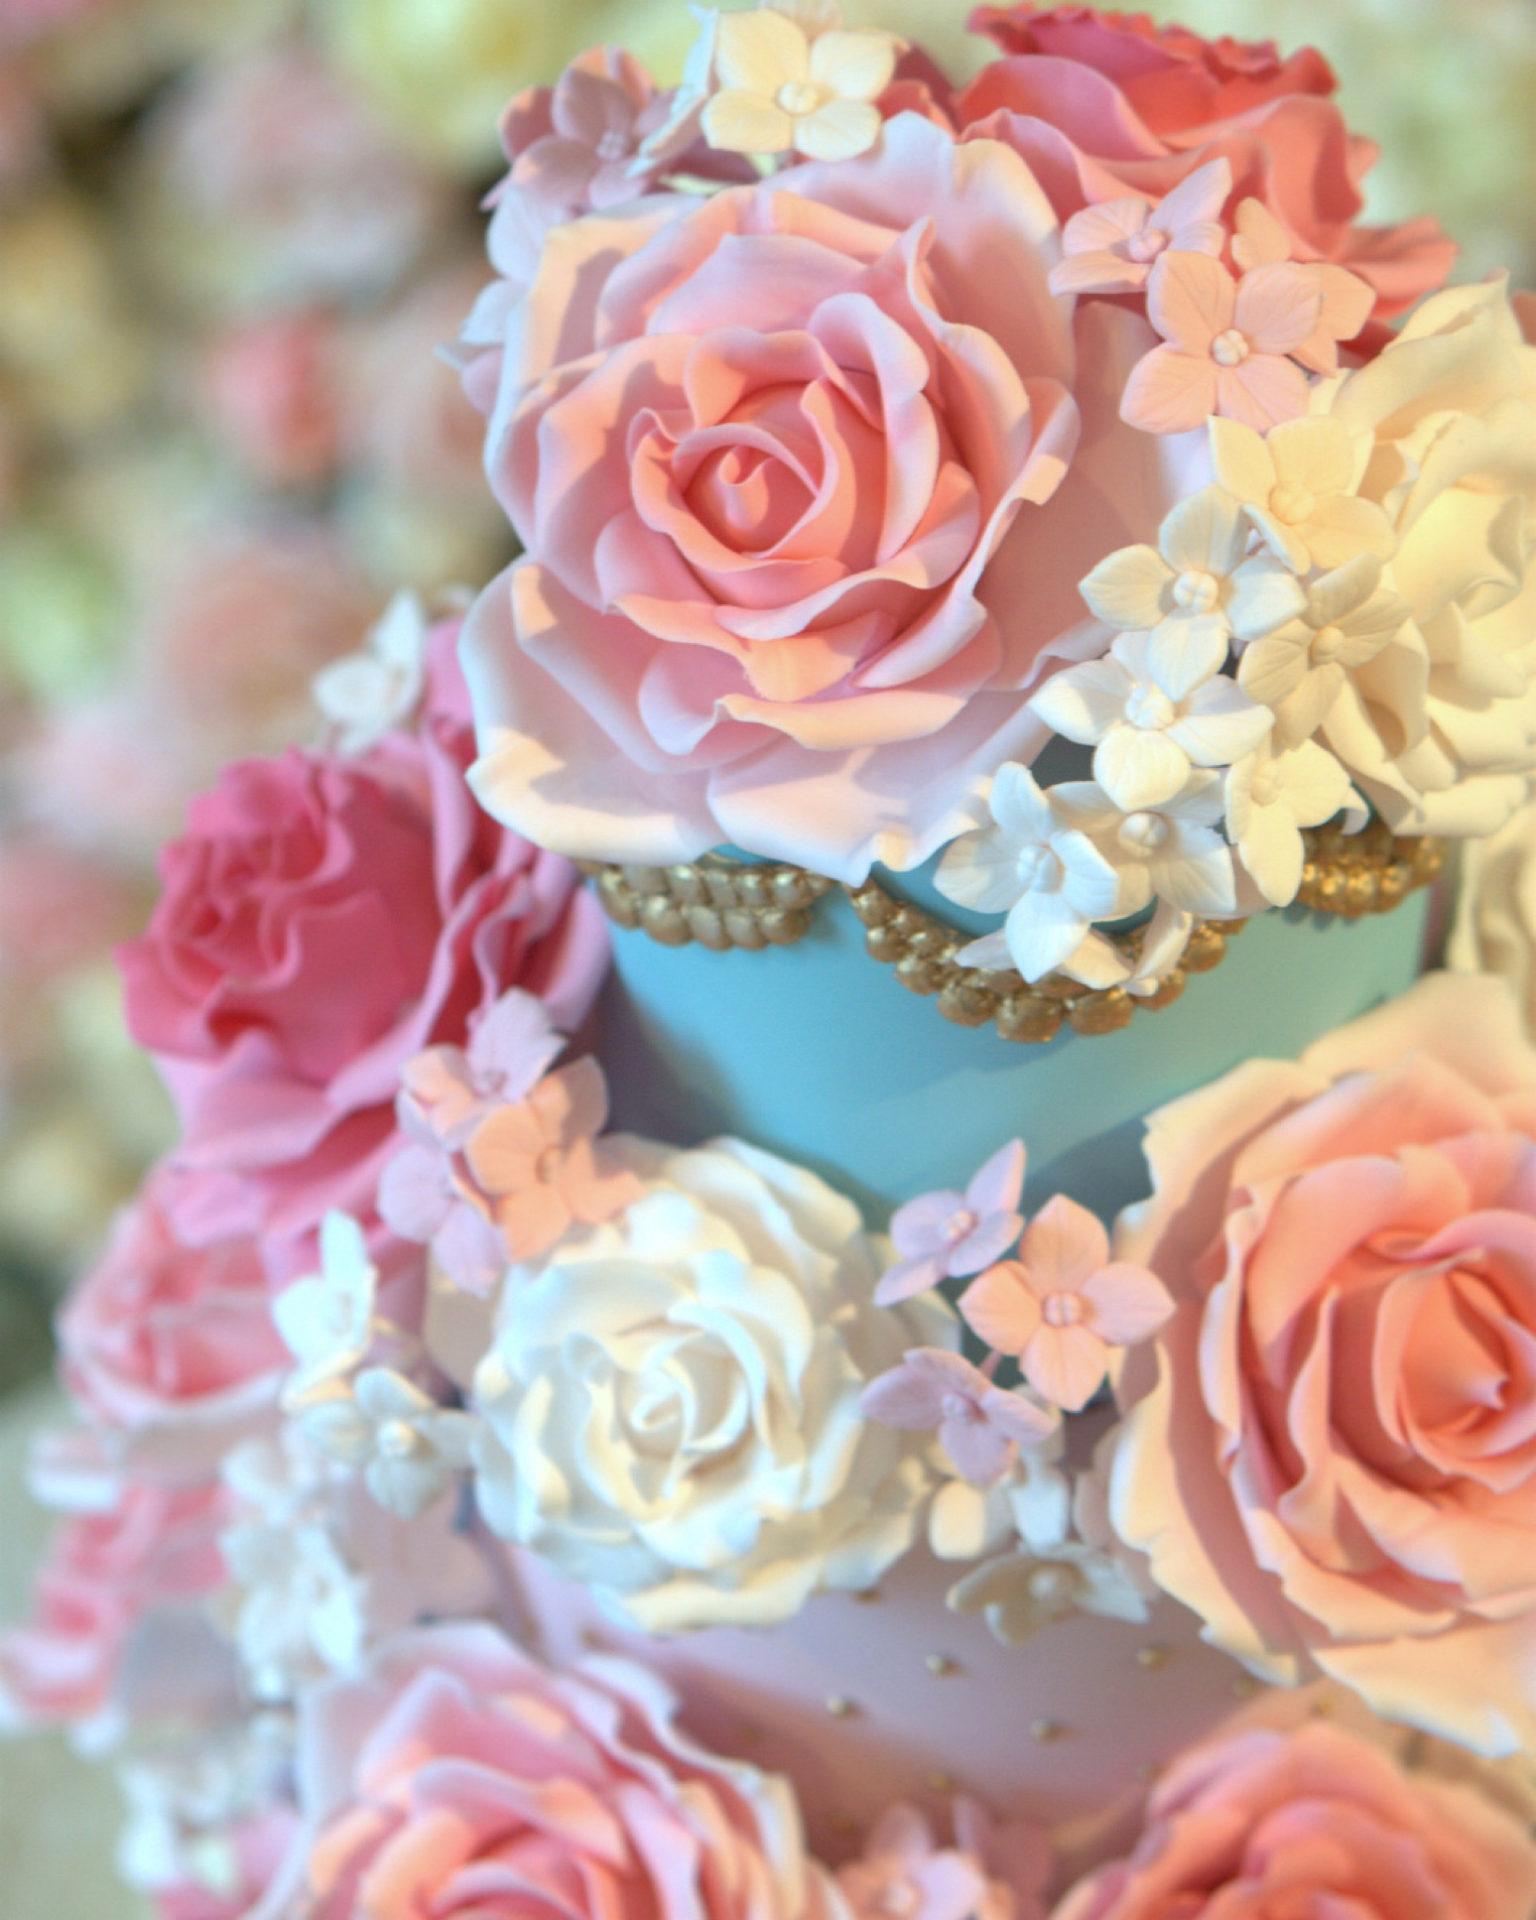 Master Class Flores de azucar, sugarflowers, curso reposteria, barcelona, mericakes, flores de azucar, pasta de goma, gumpaste, 5